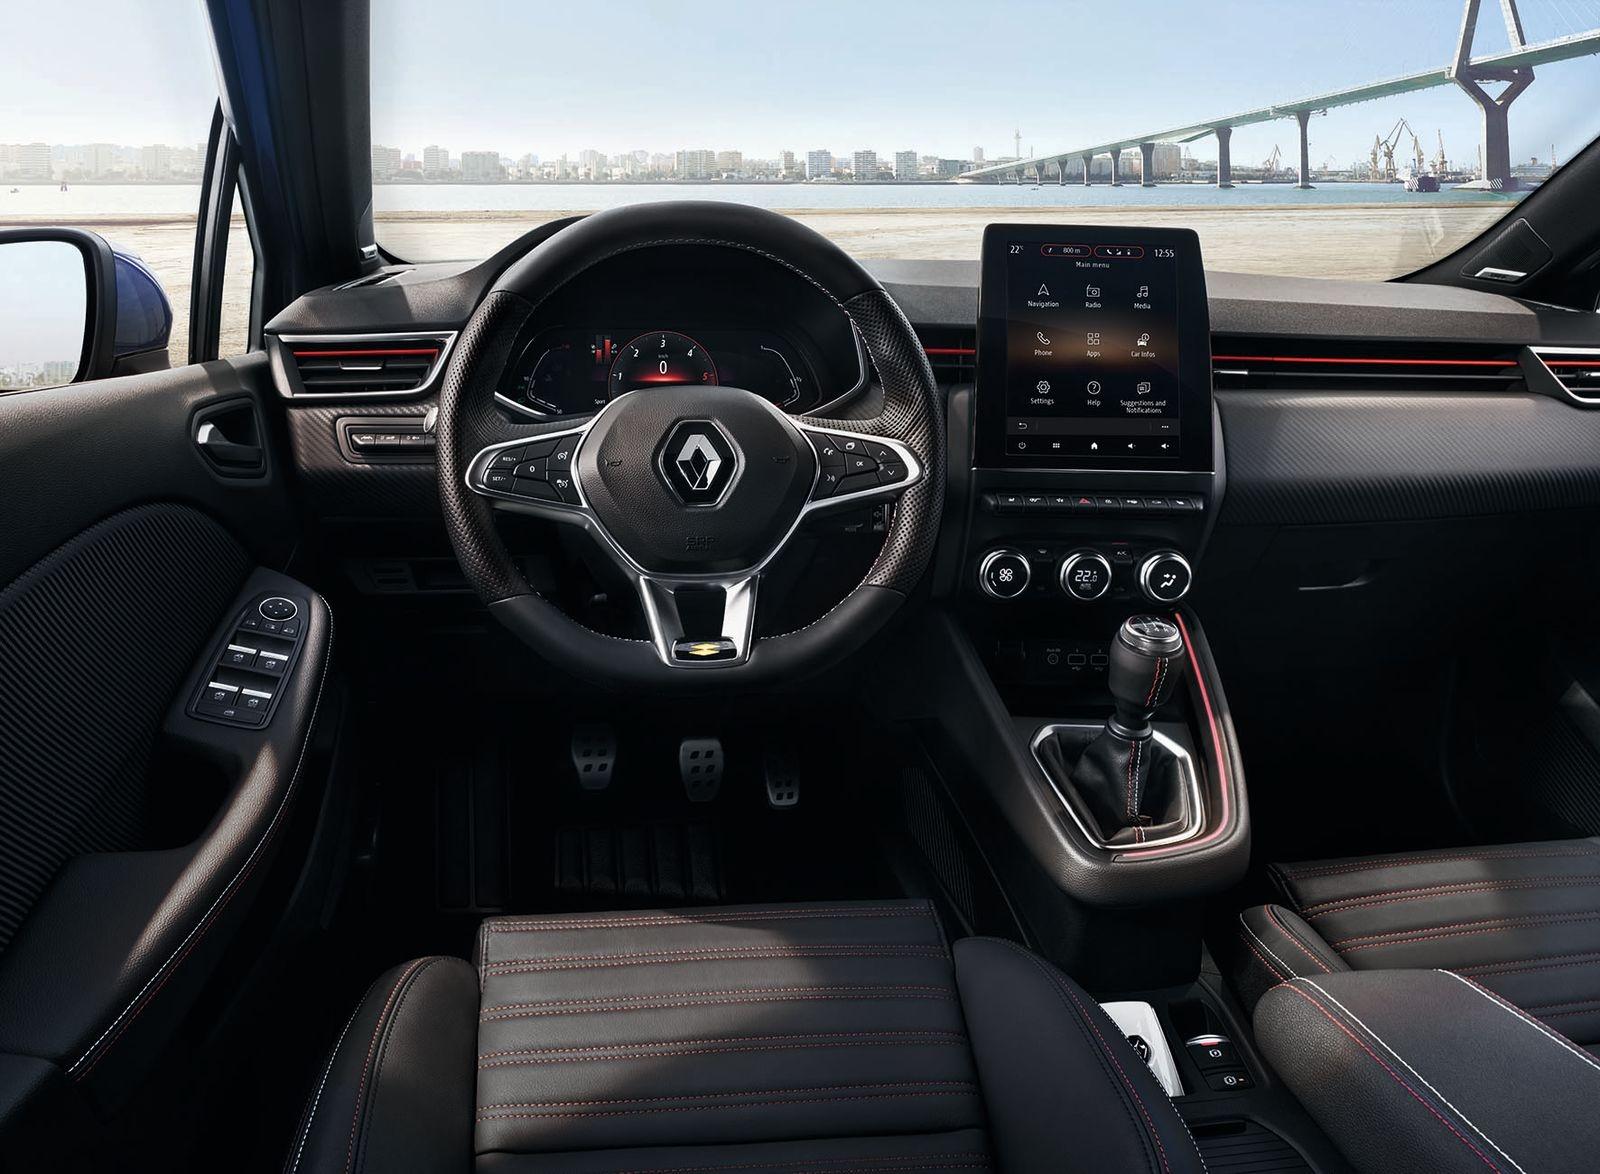 Renault_Clio_2019_AutoRok_03